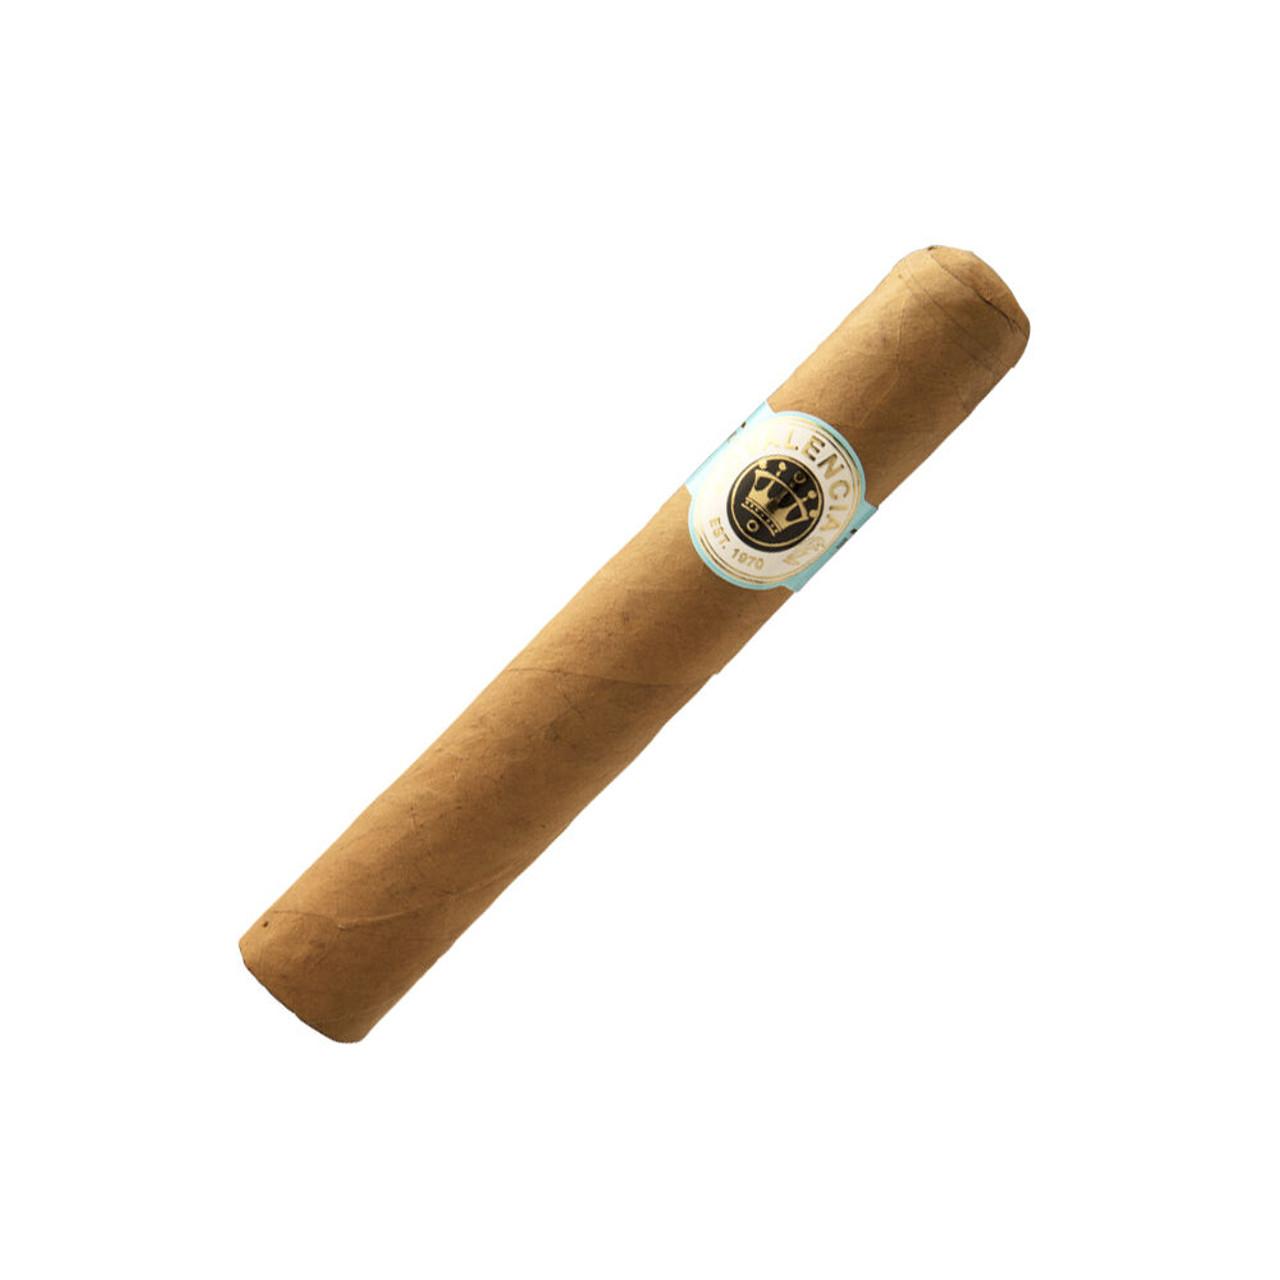 Valencia Connecticut Robusto Cigars - 5 x 50 (Box of 20)